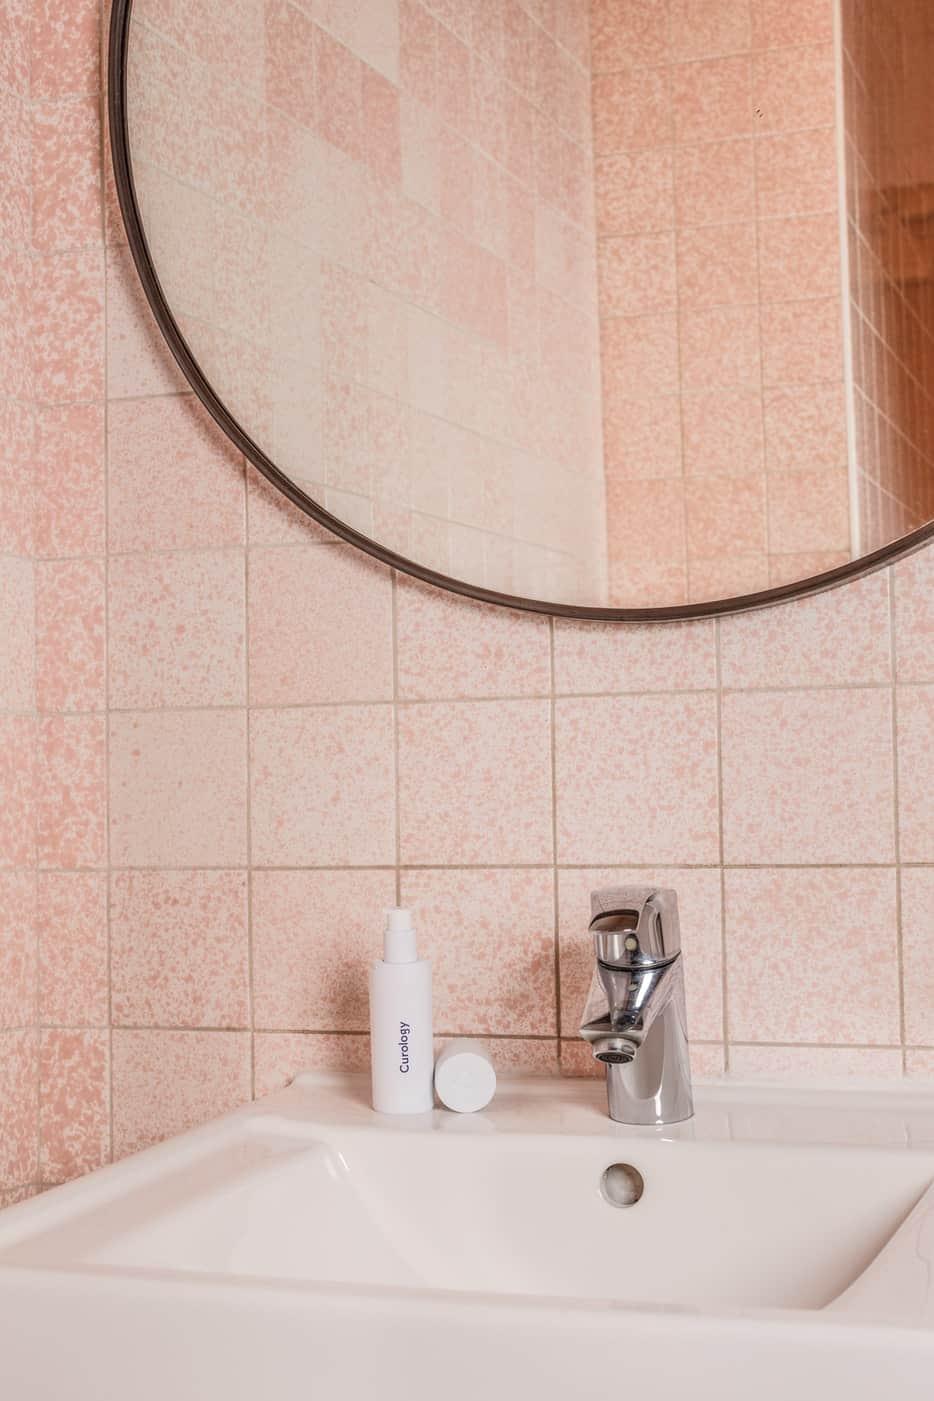 Use Pink Tile